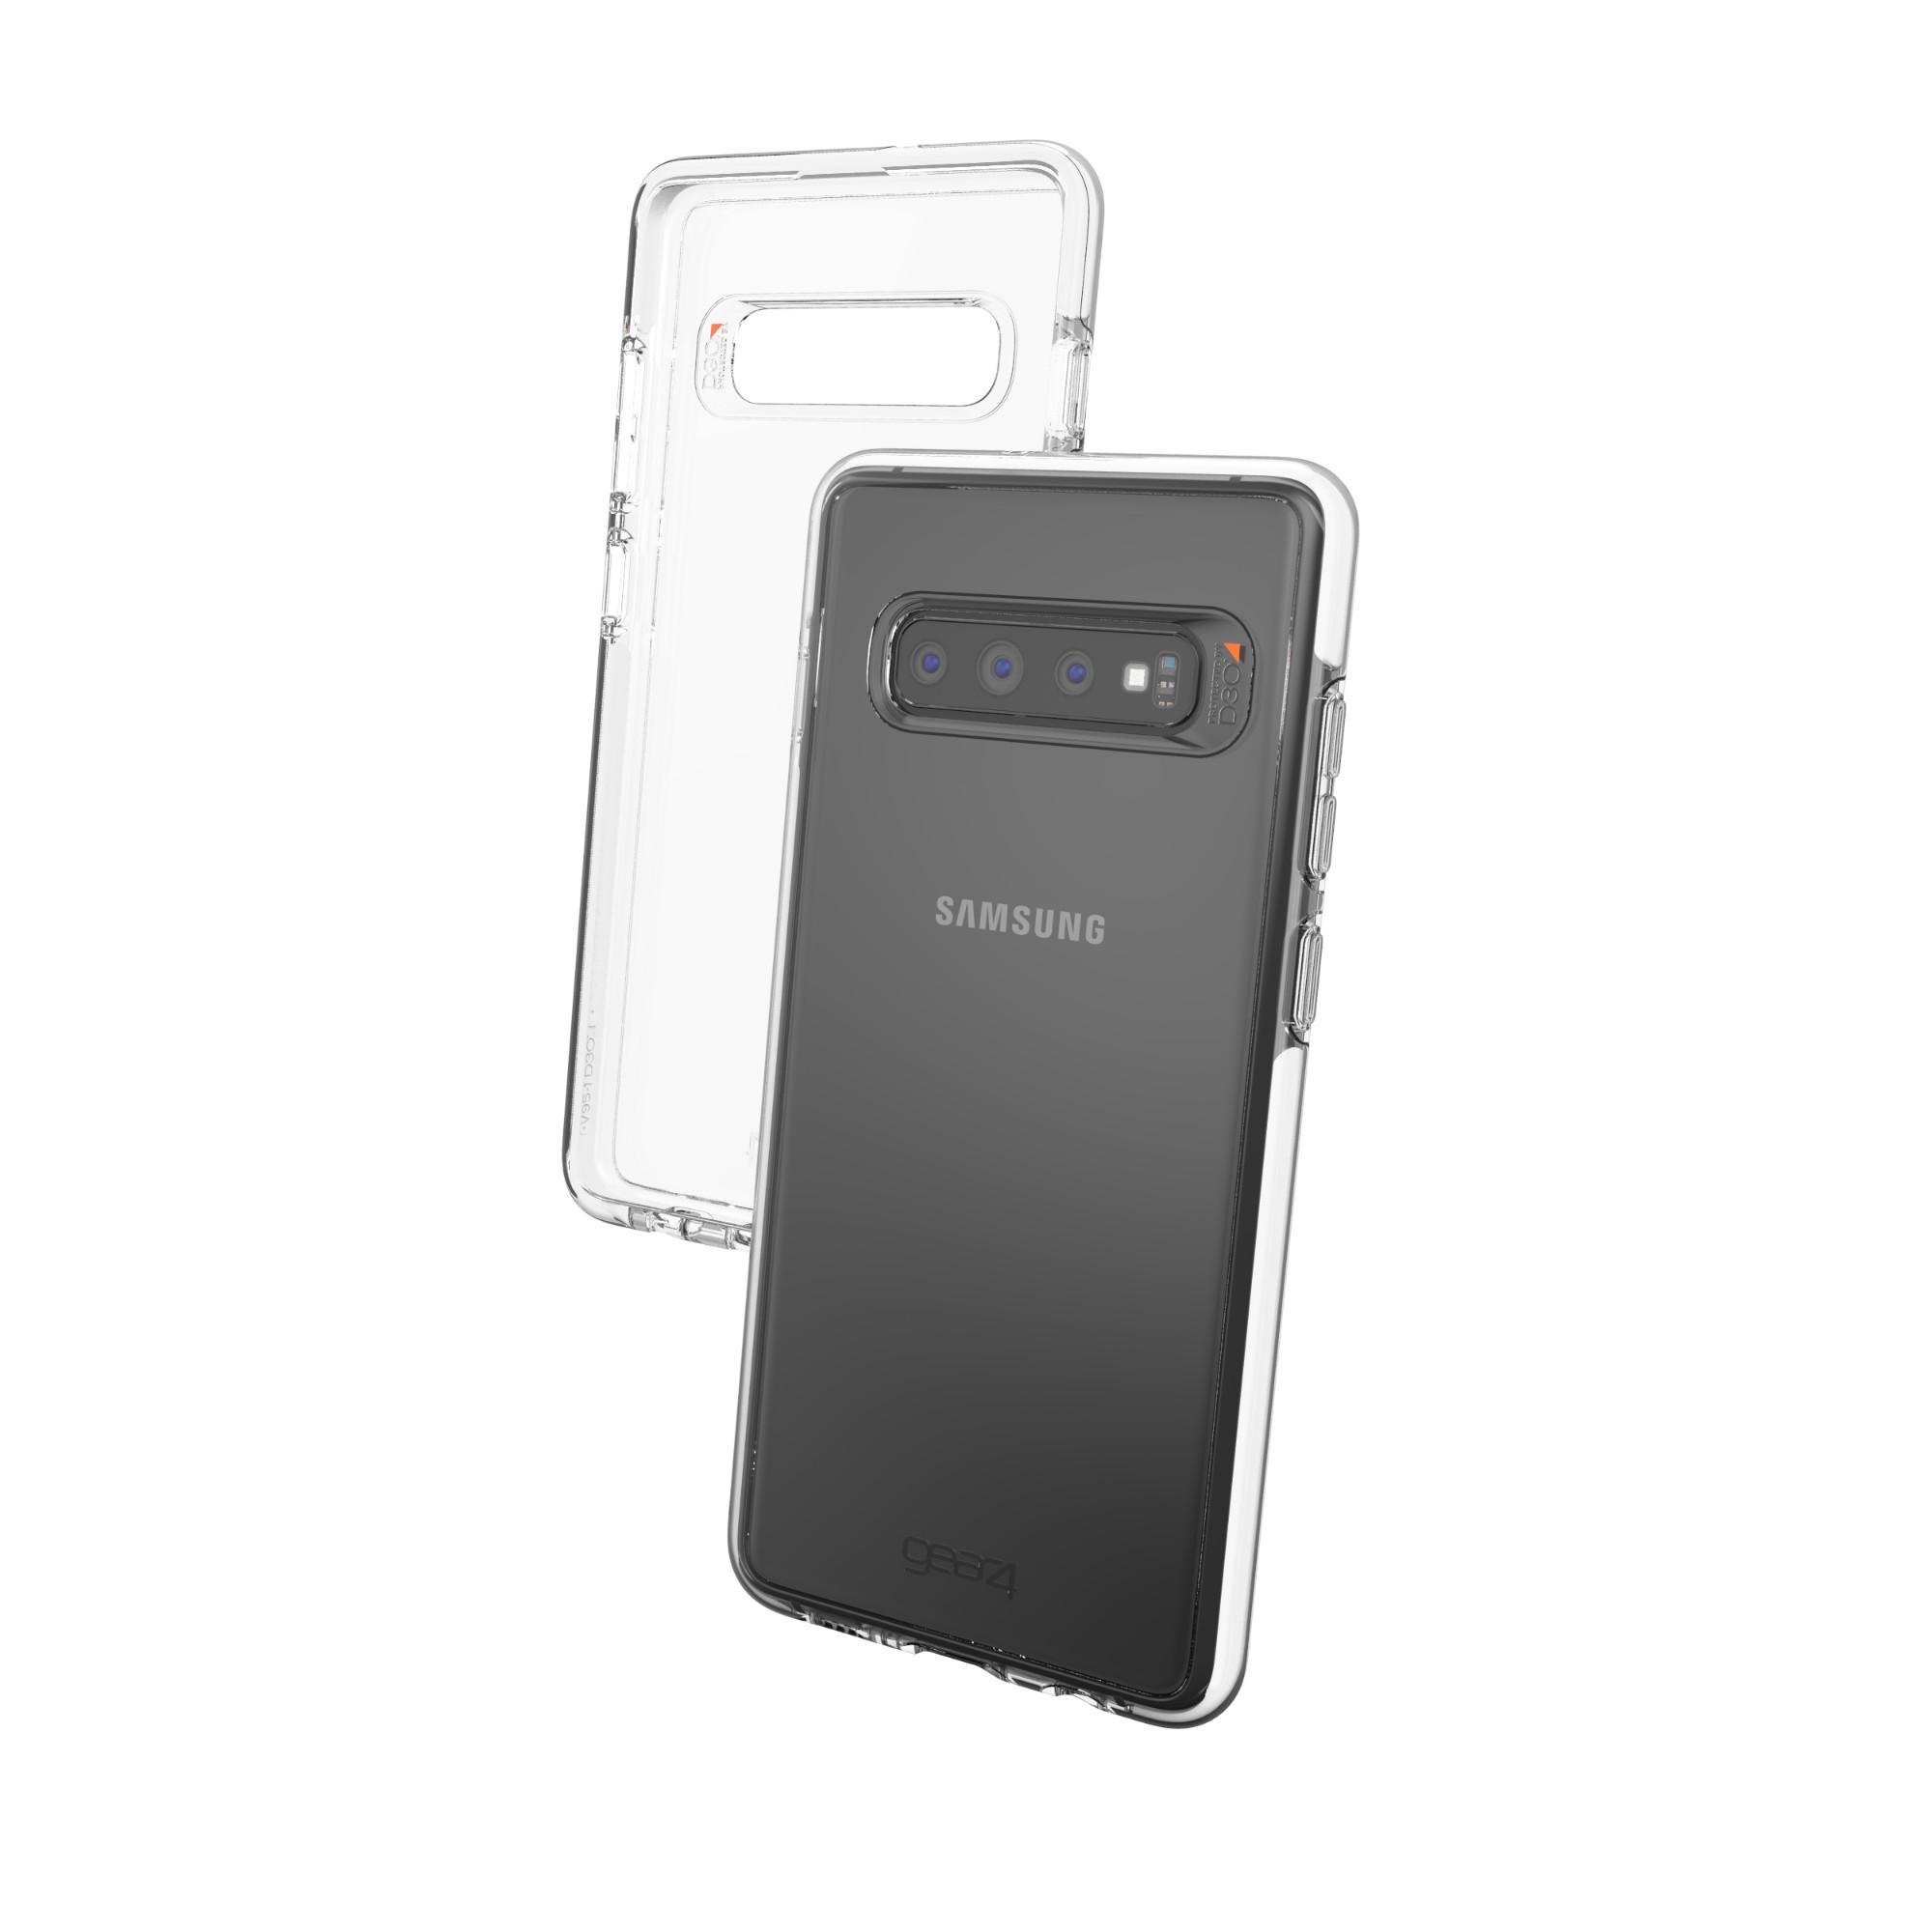 "GEAR4 Piccadilly funda para teléfono móvil 16,3 cm (6.4"") Negro, Transparente"